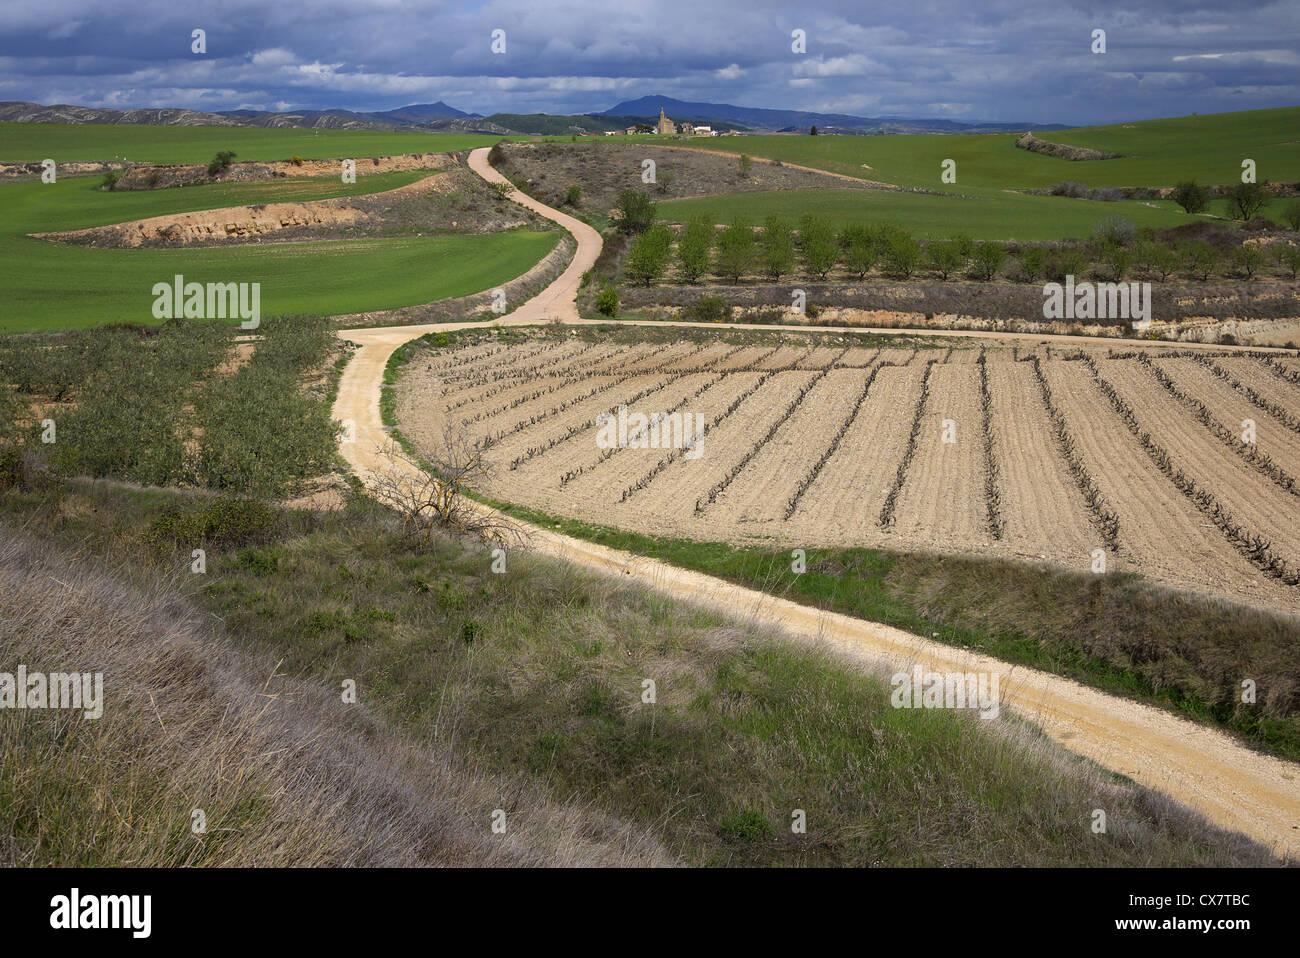 The Camino de Santiago trail crossing the Spanish countryside near Los Arcos. - Stock Image